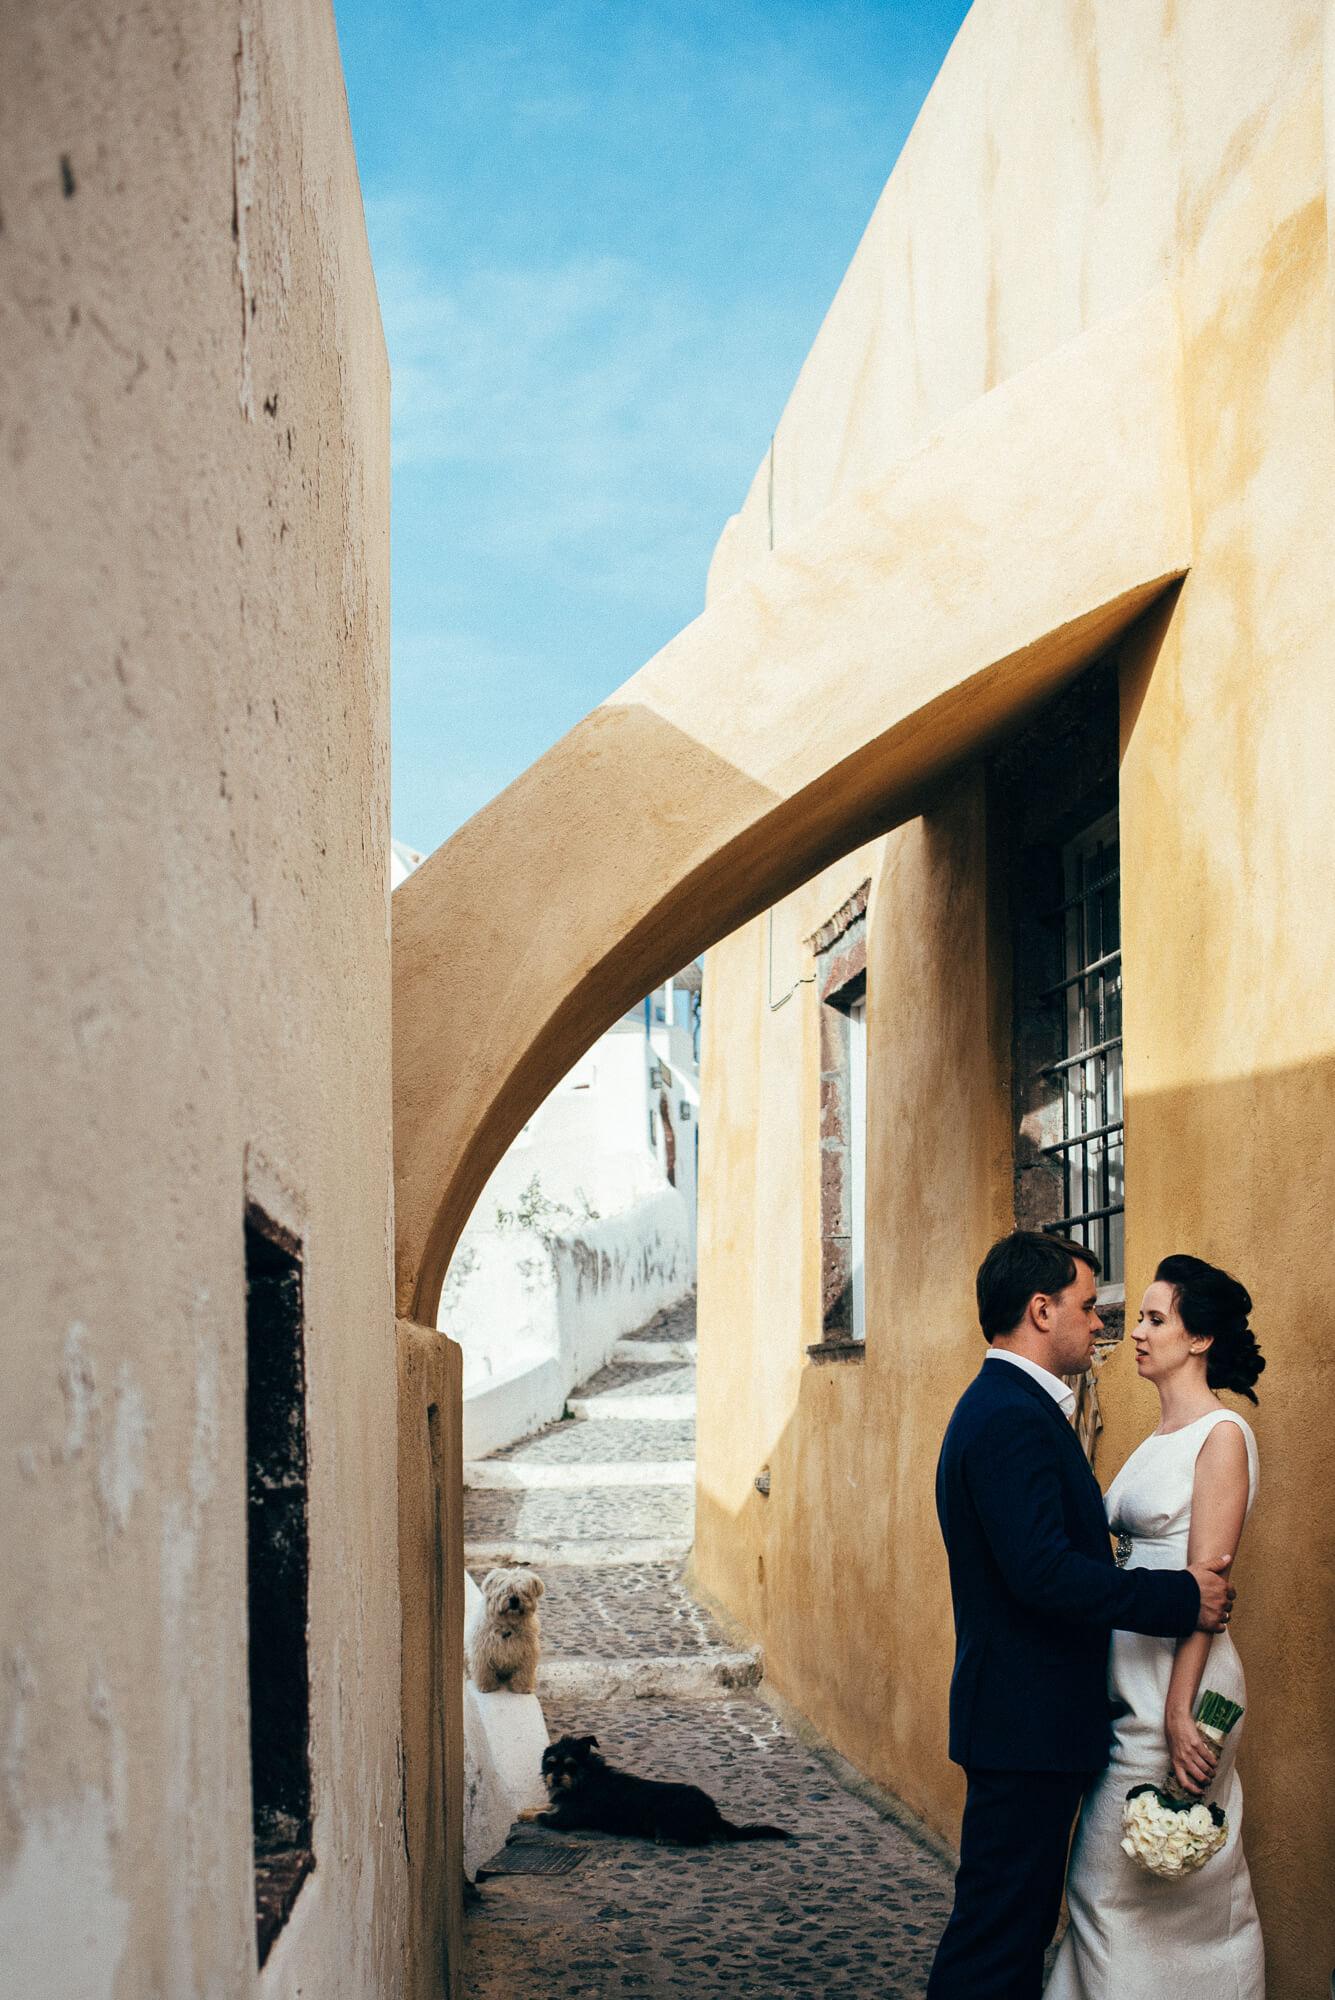 manes-wedding-photographer-greece-158